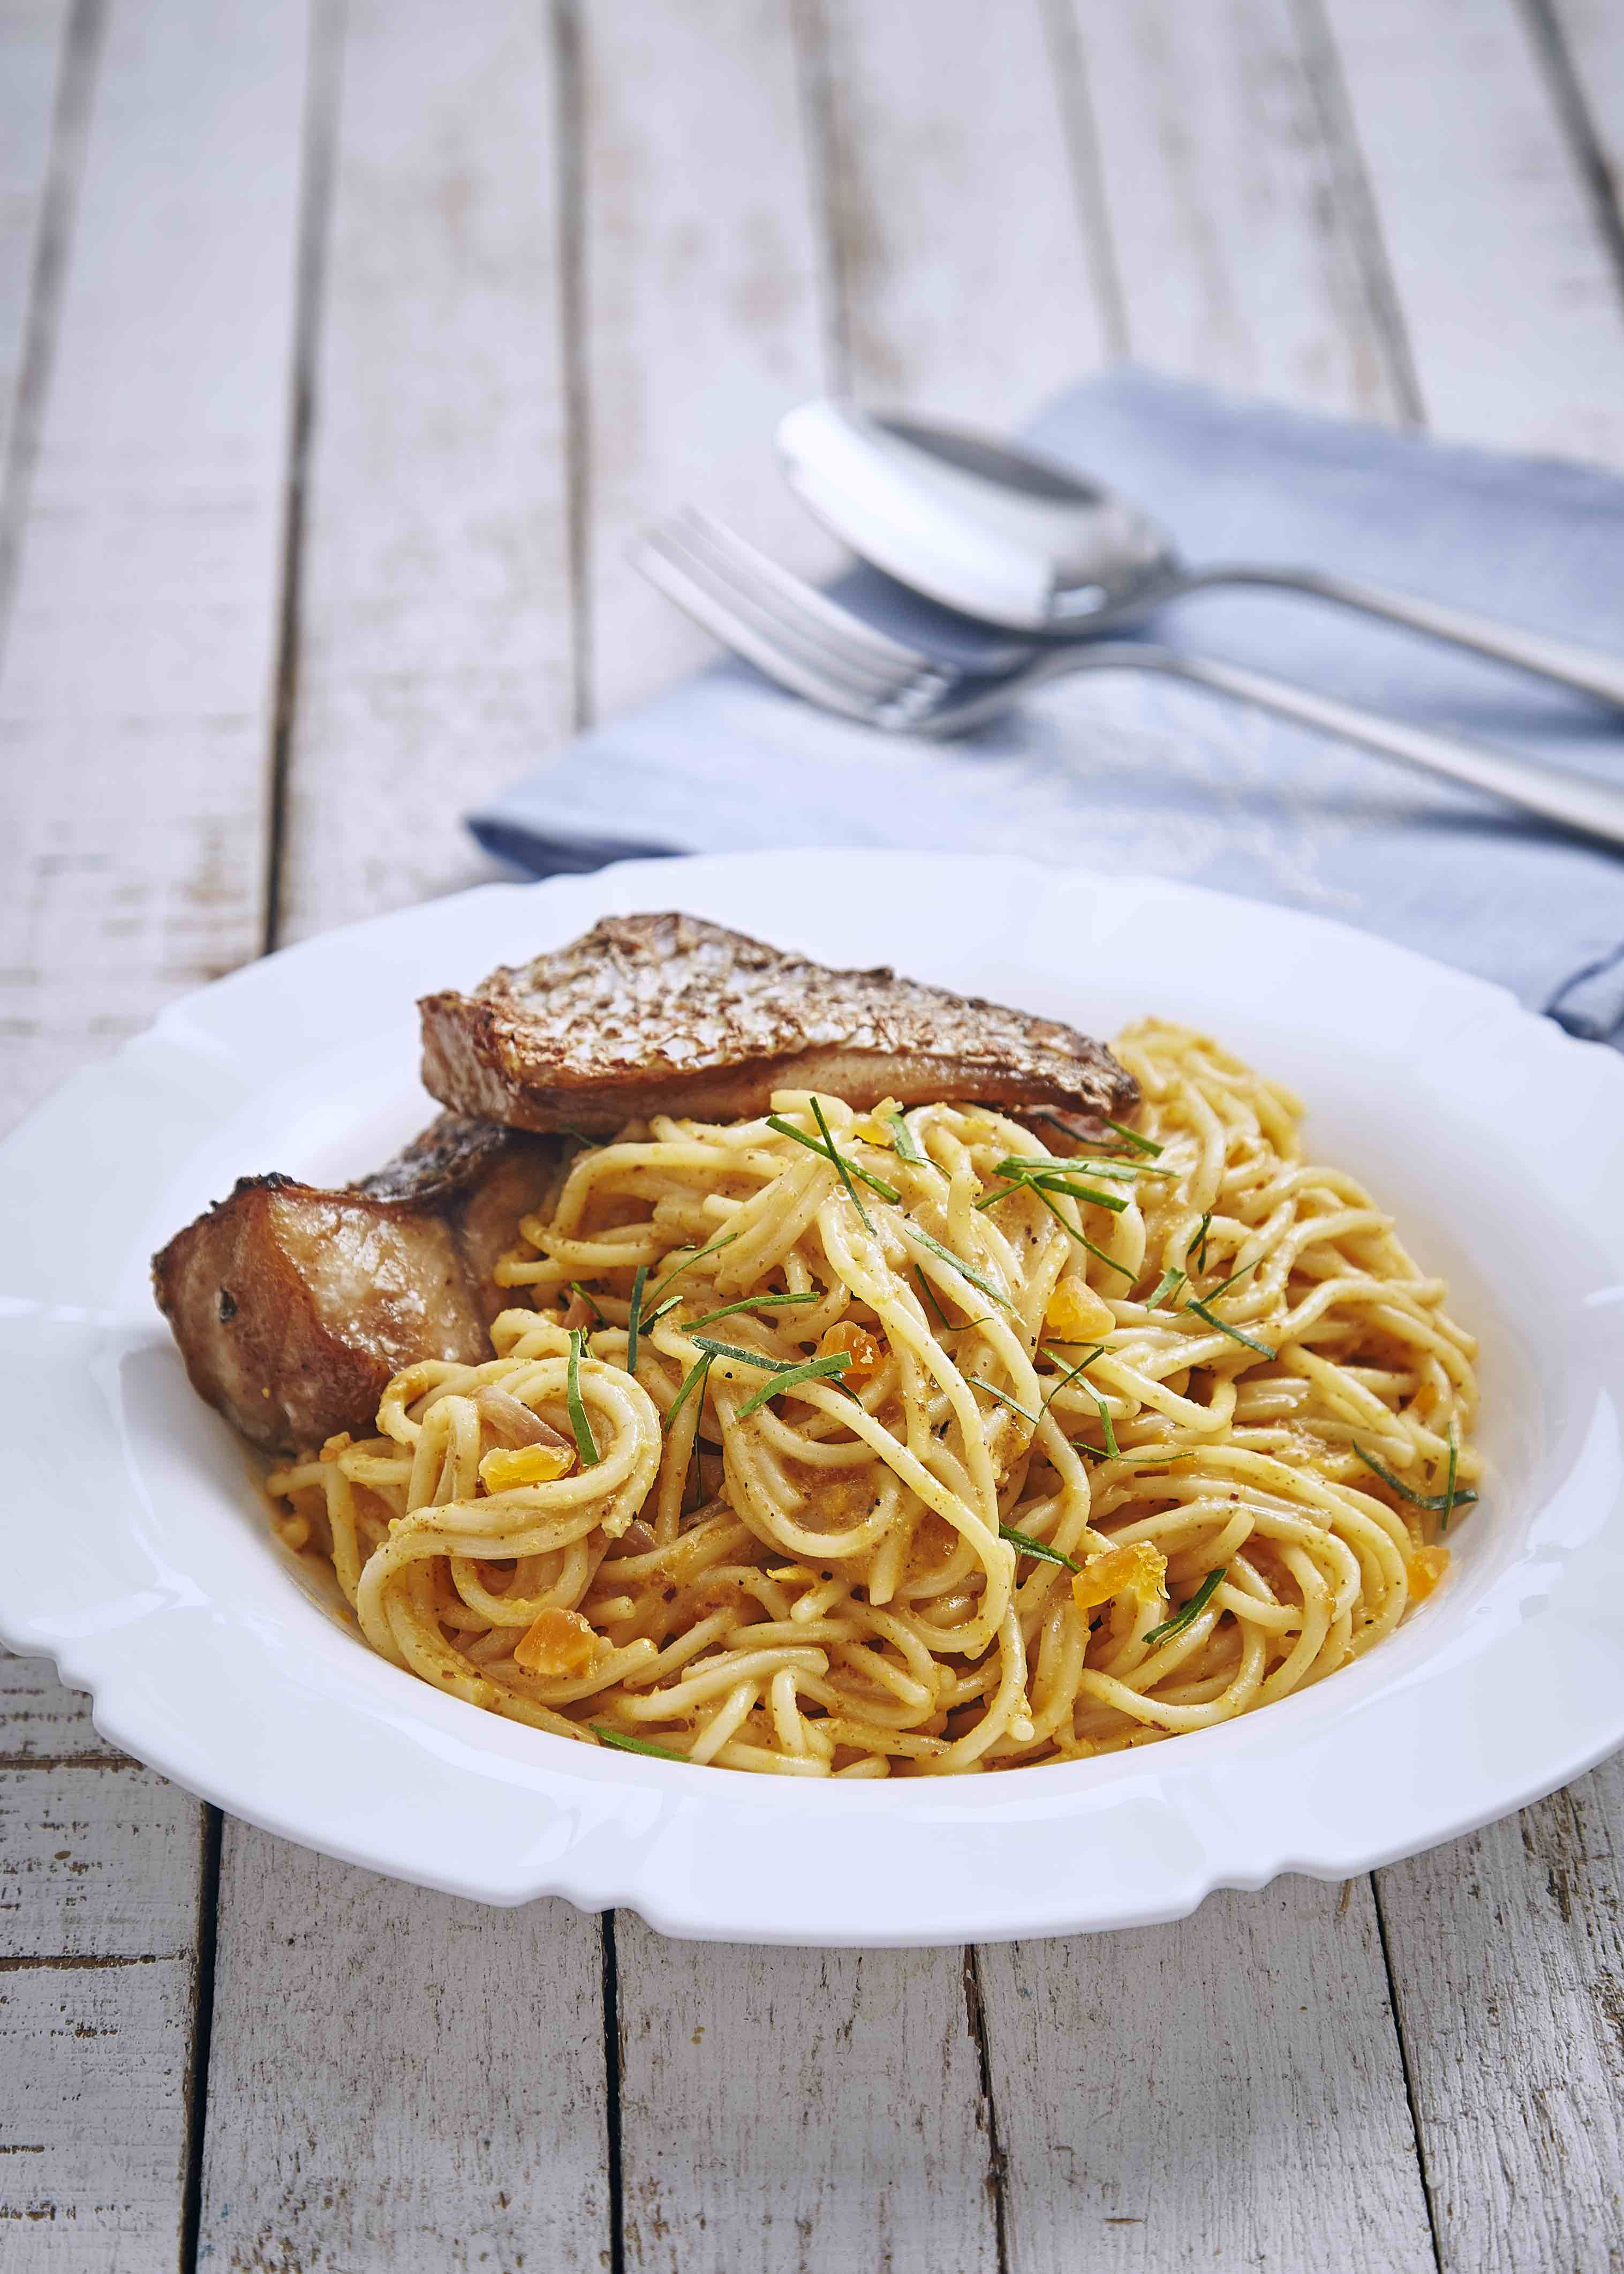 menu sihat Spageti Telur Masin bersama Filet Ikan